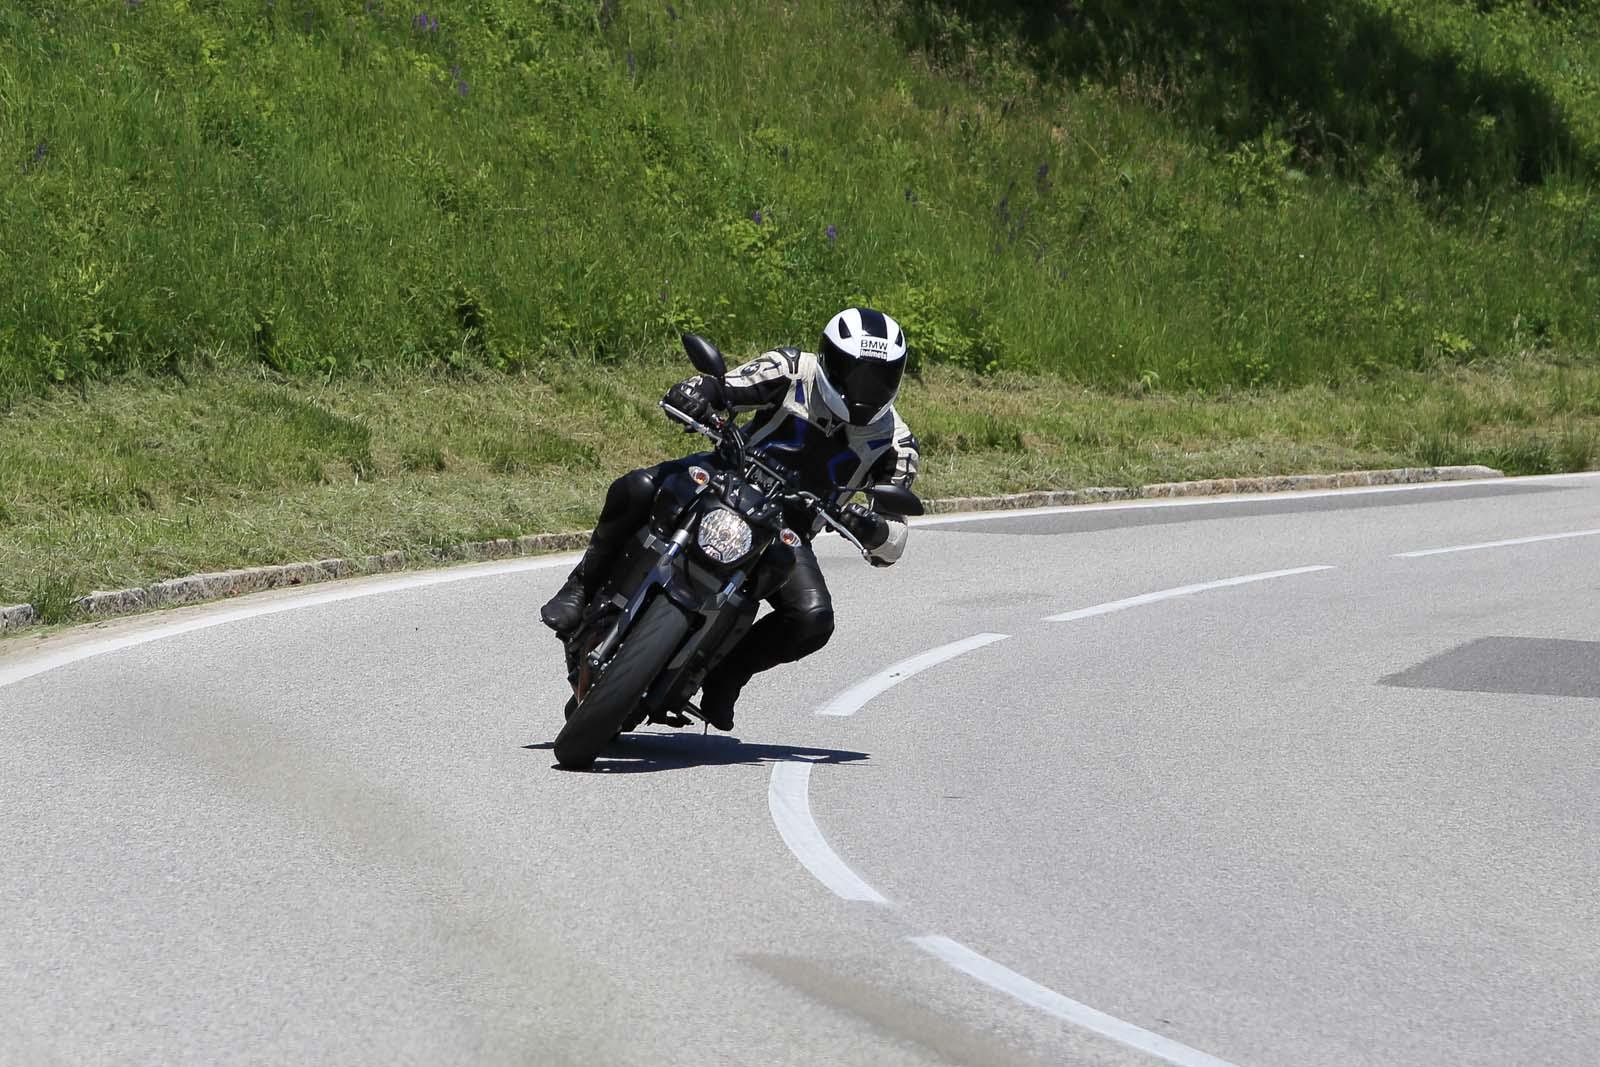 http://www.motorrad-bilder.at/slideshows/291/011178/NakedbikeTestAuswahl4.jpg